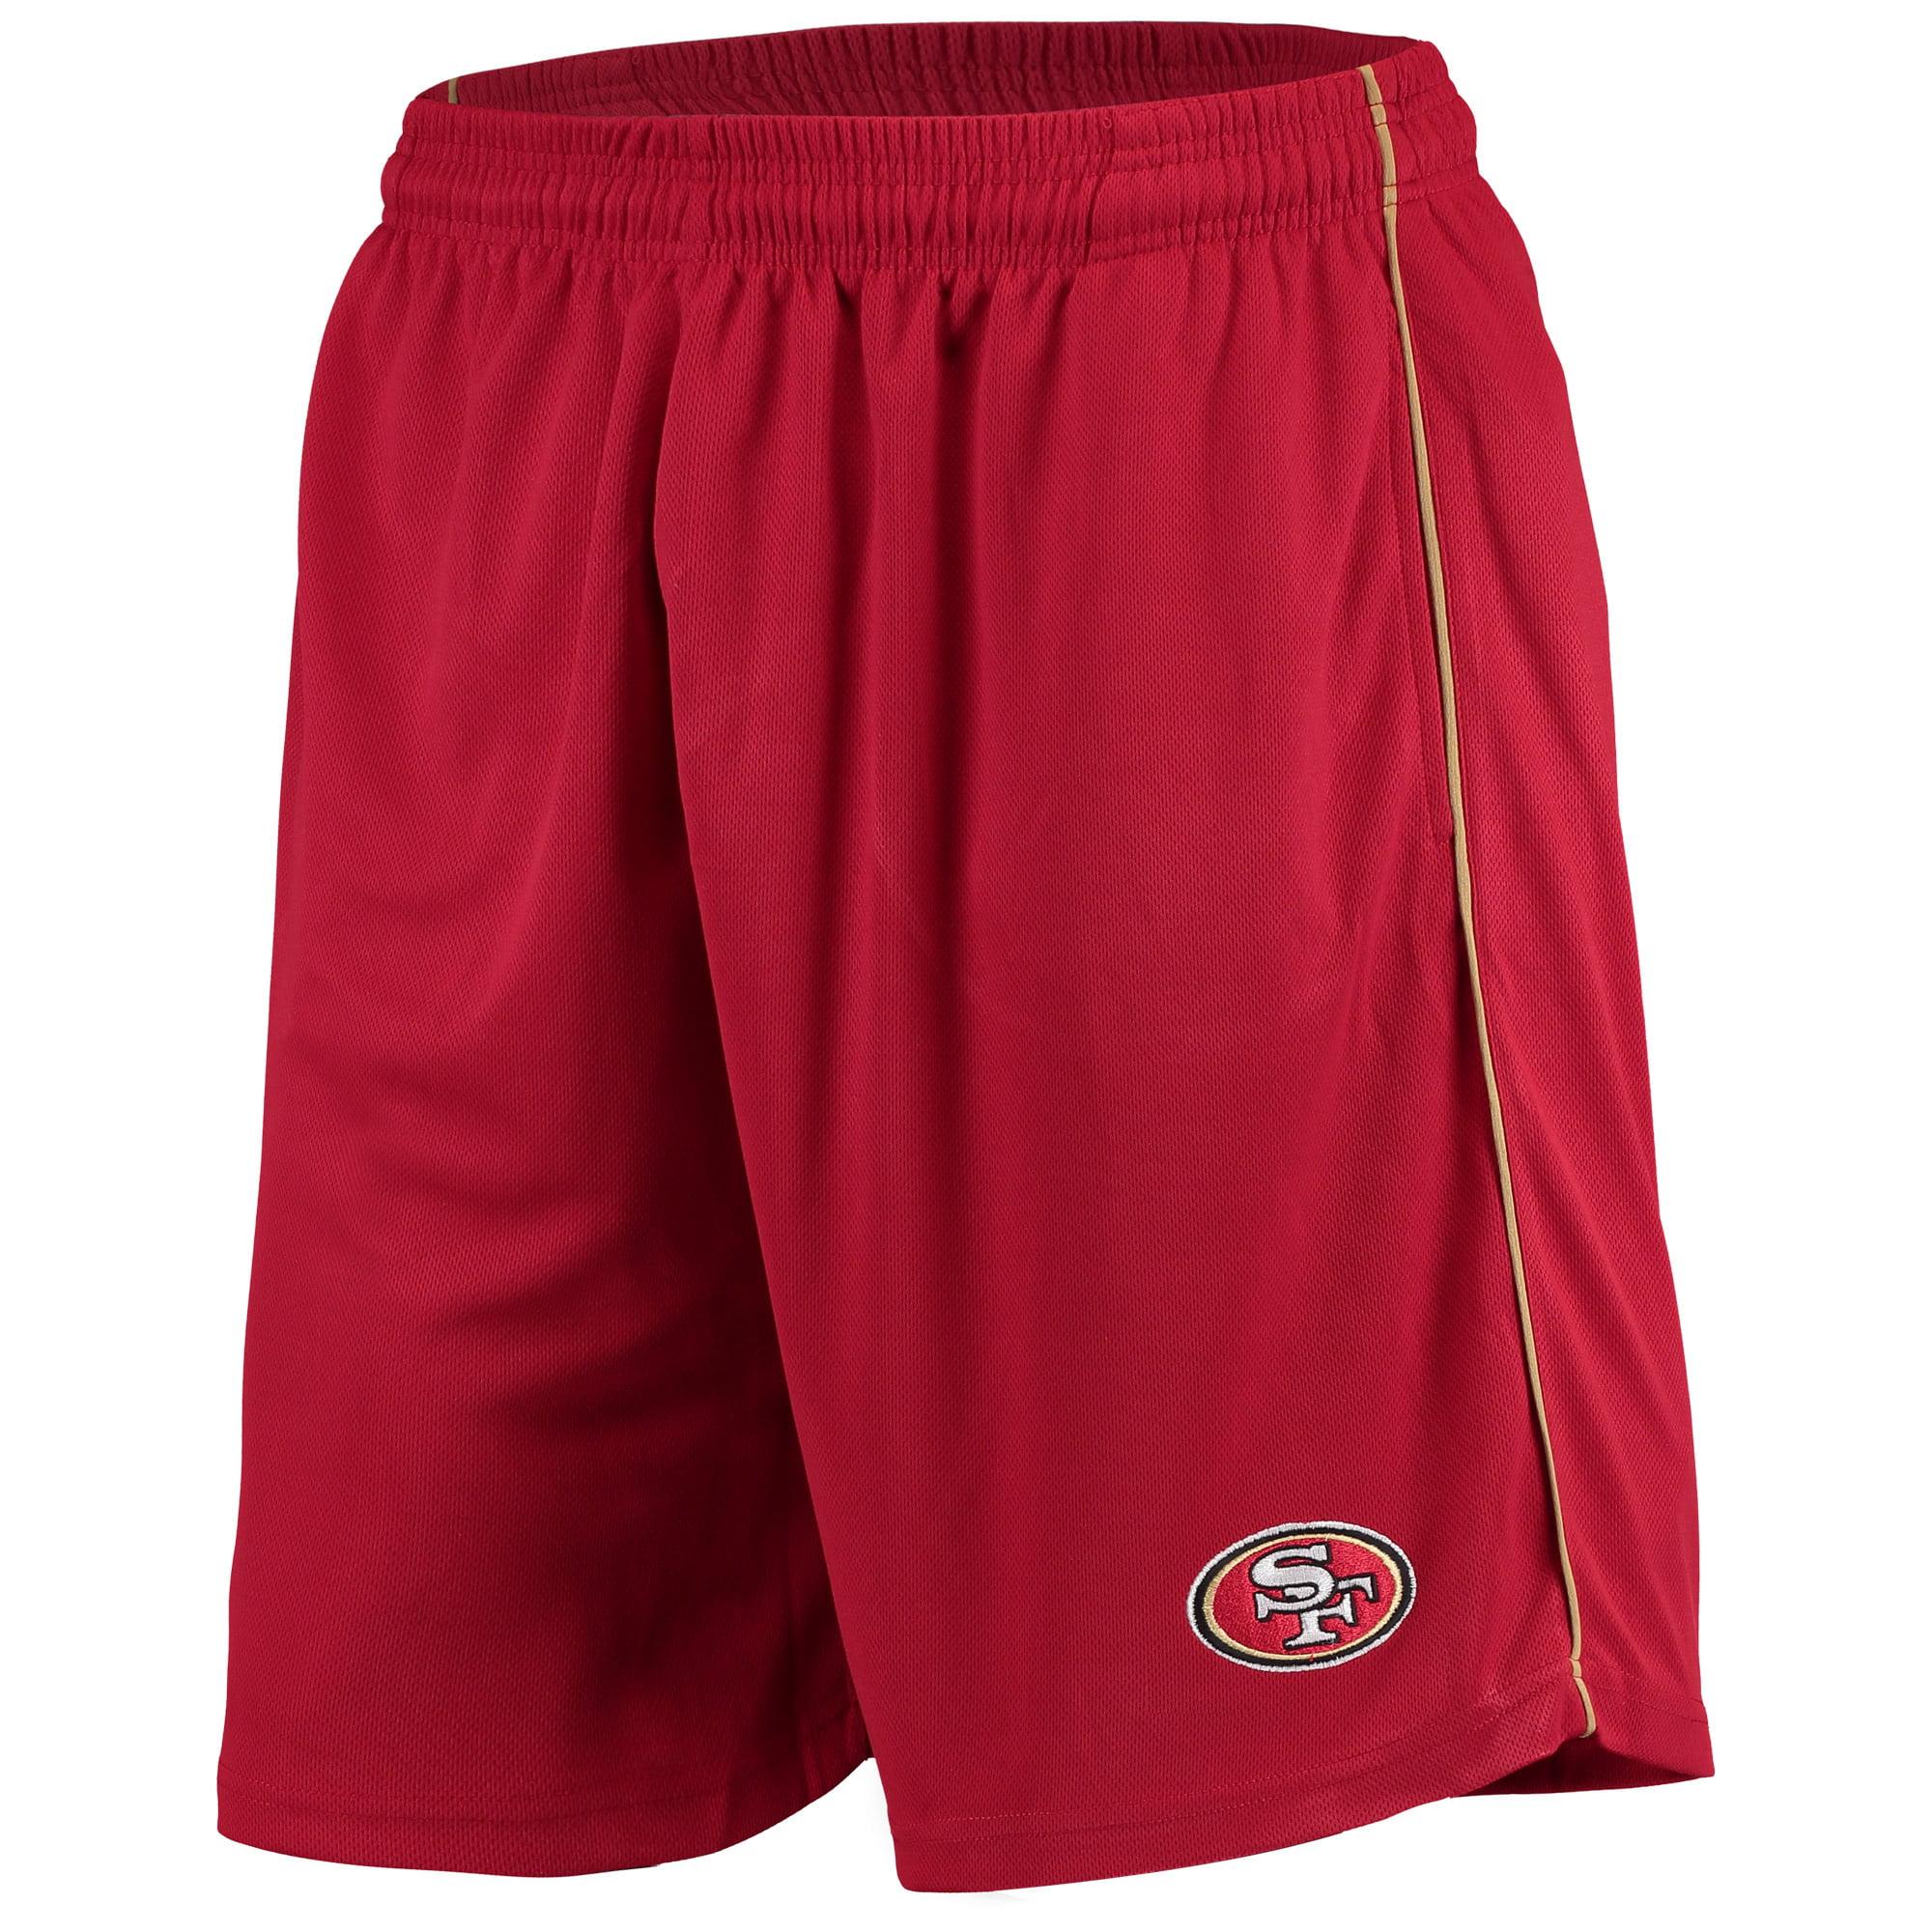 Men's Majestic Scarlet San Francisco 49ers Mesh Shorts